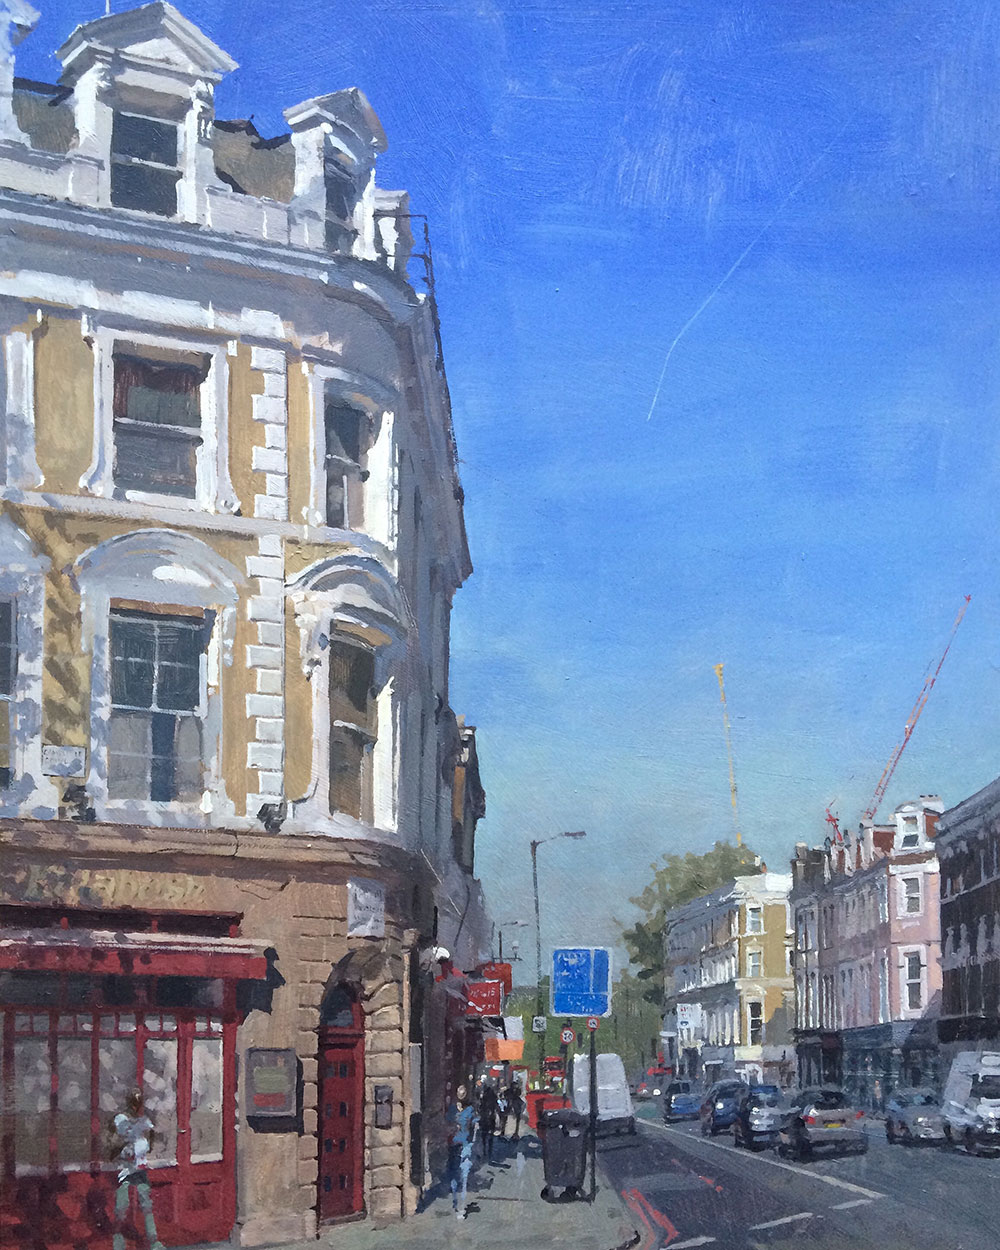 Bins and Blue Skies, Camberwell. 2016, oil on board, 30 x 40 cm Benjamin Hope